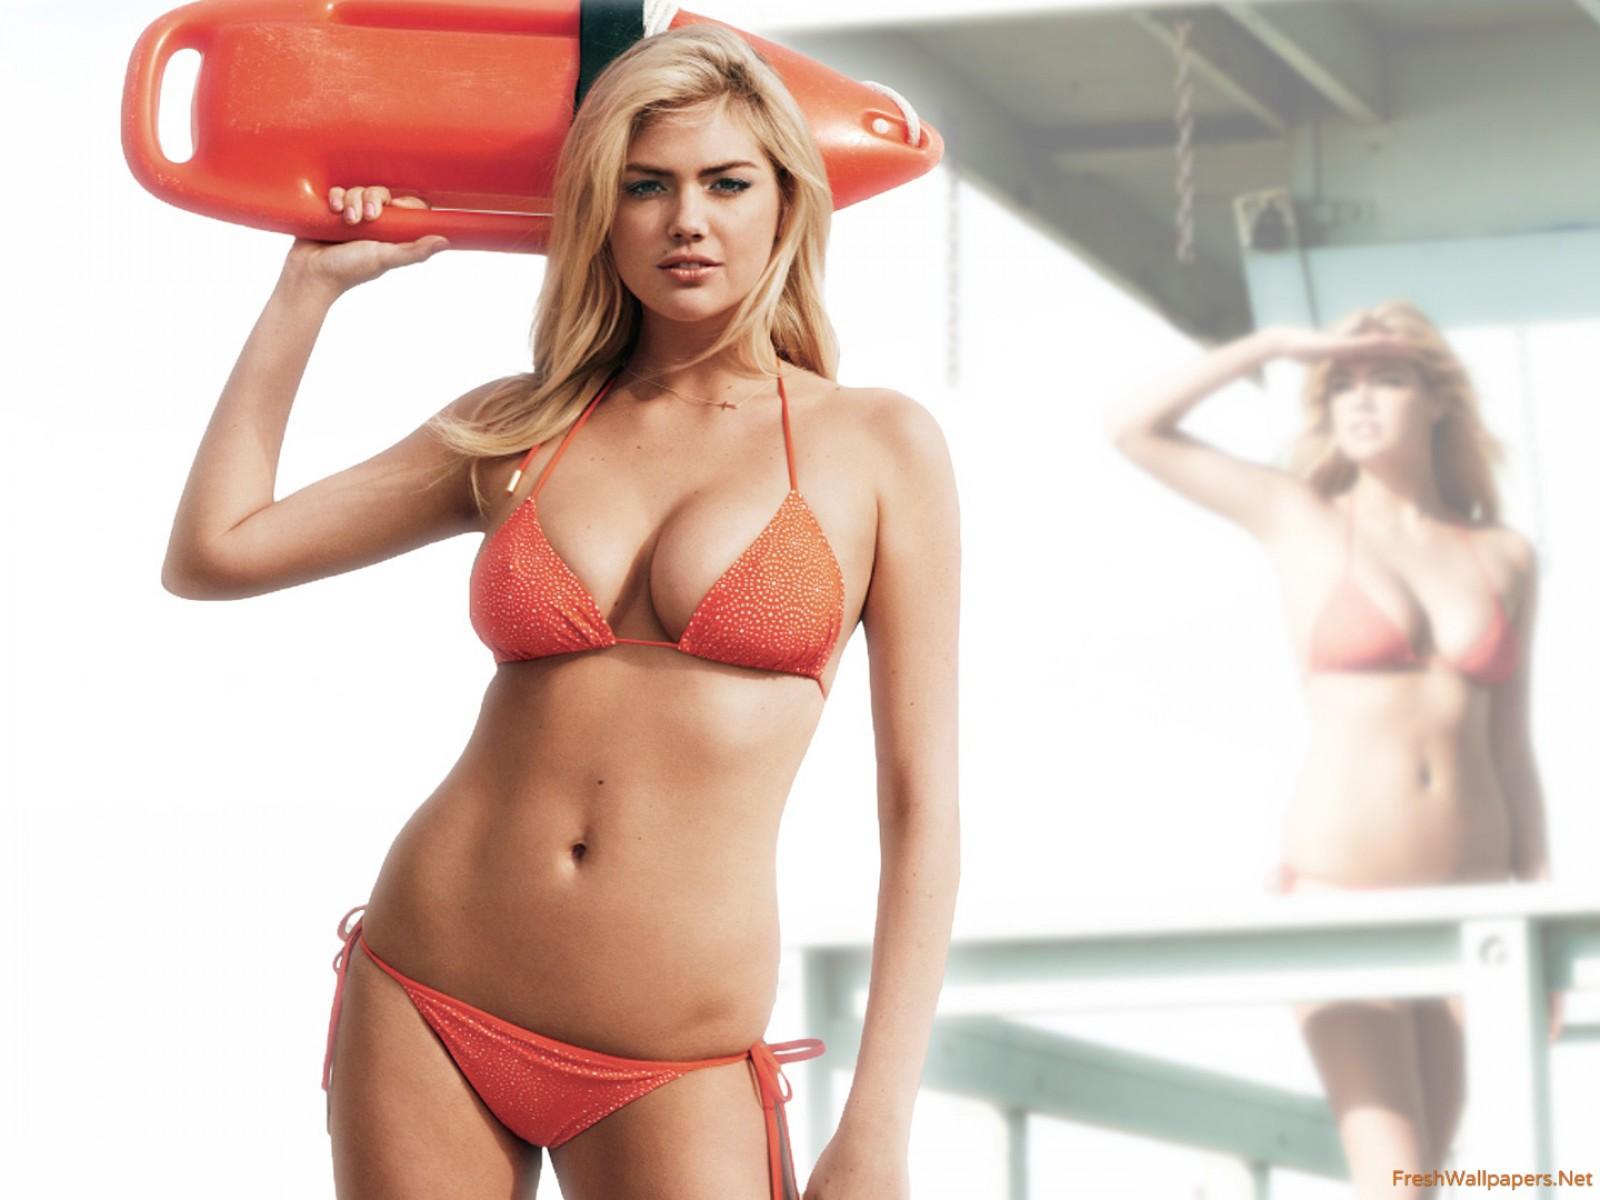 Kate Upton in Red Bikini wallpaper